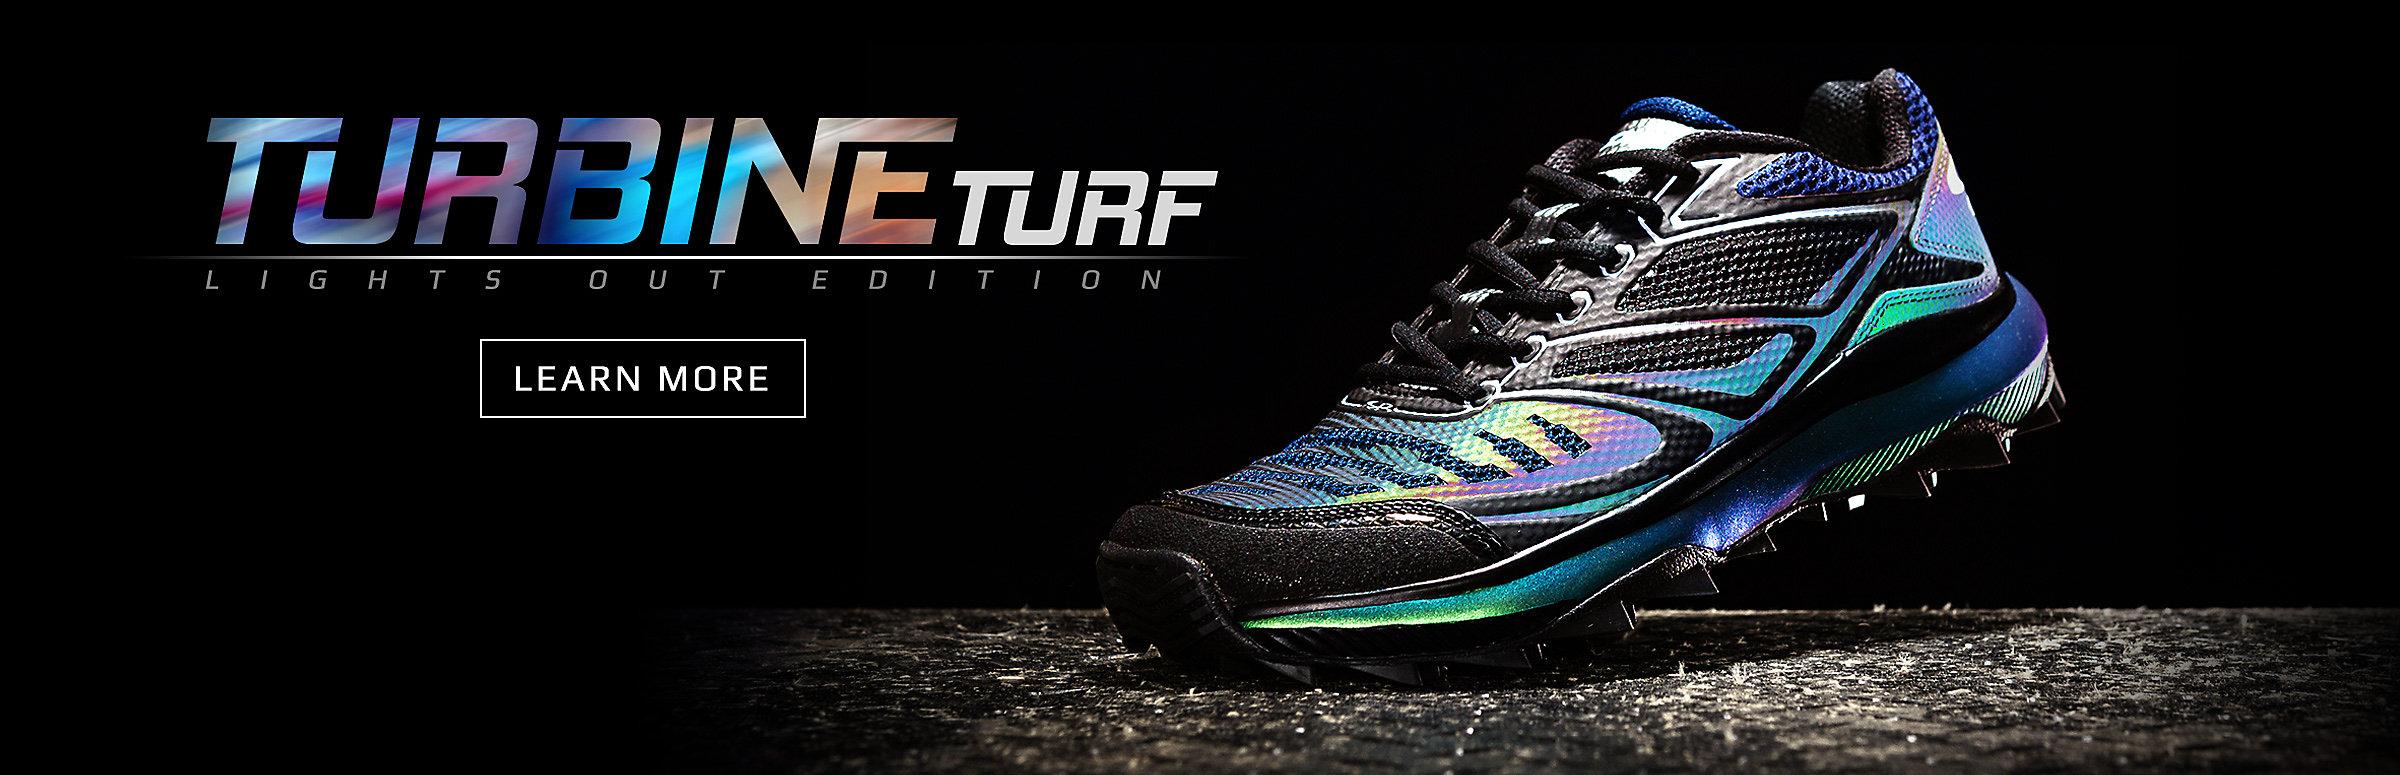 Turbine Turf Shoes